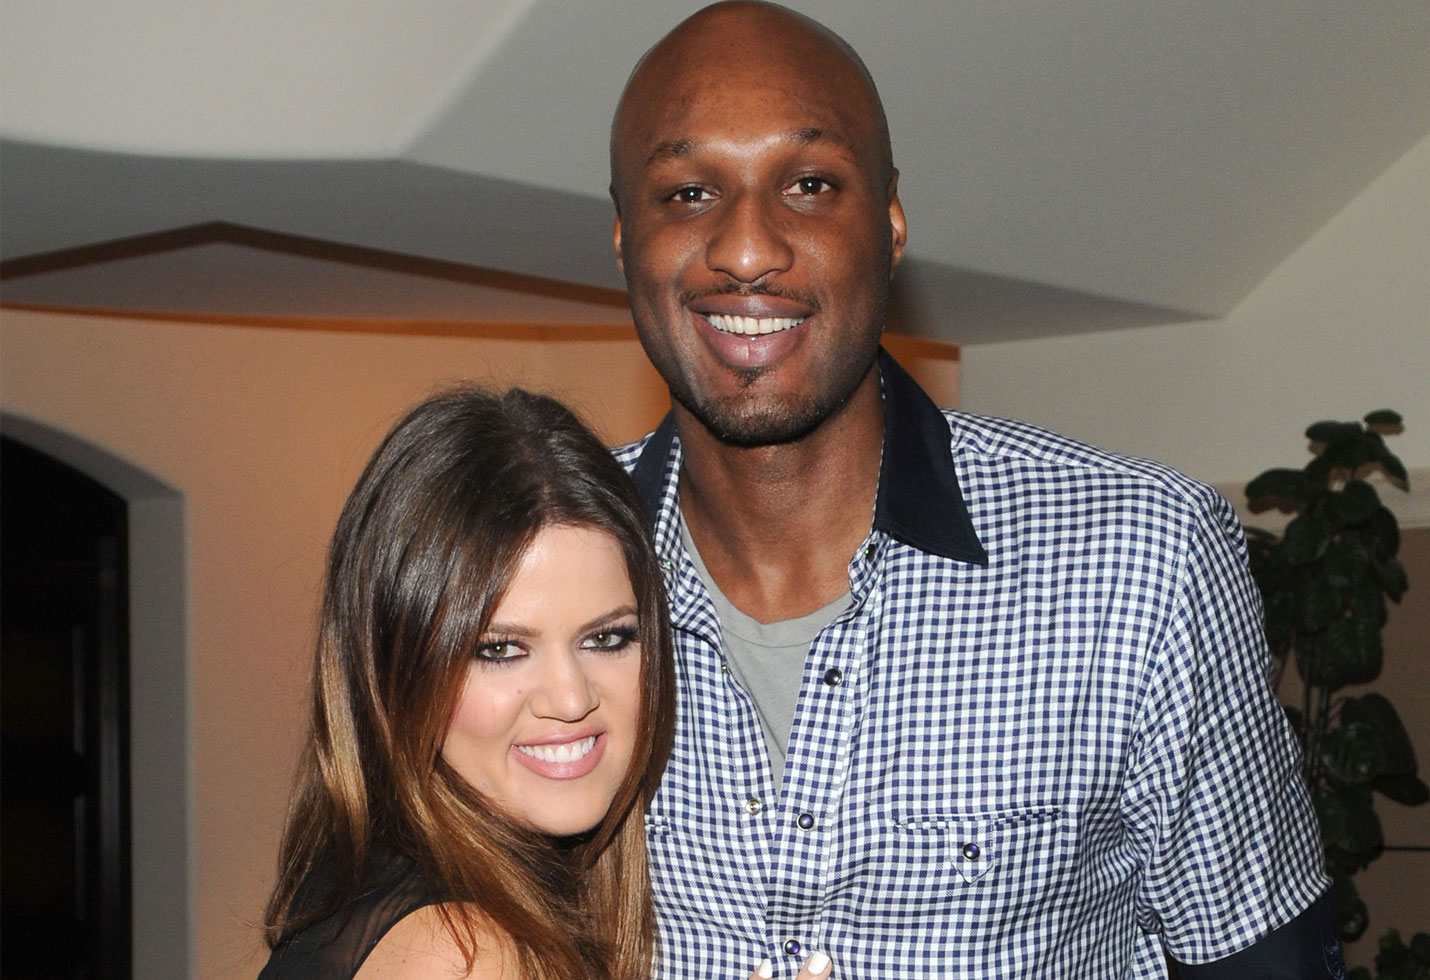 Lamar odom threatened kill khloe kardashian memoir